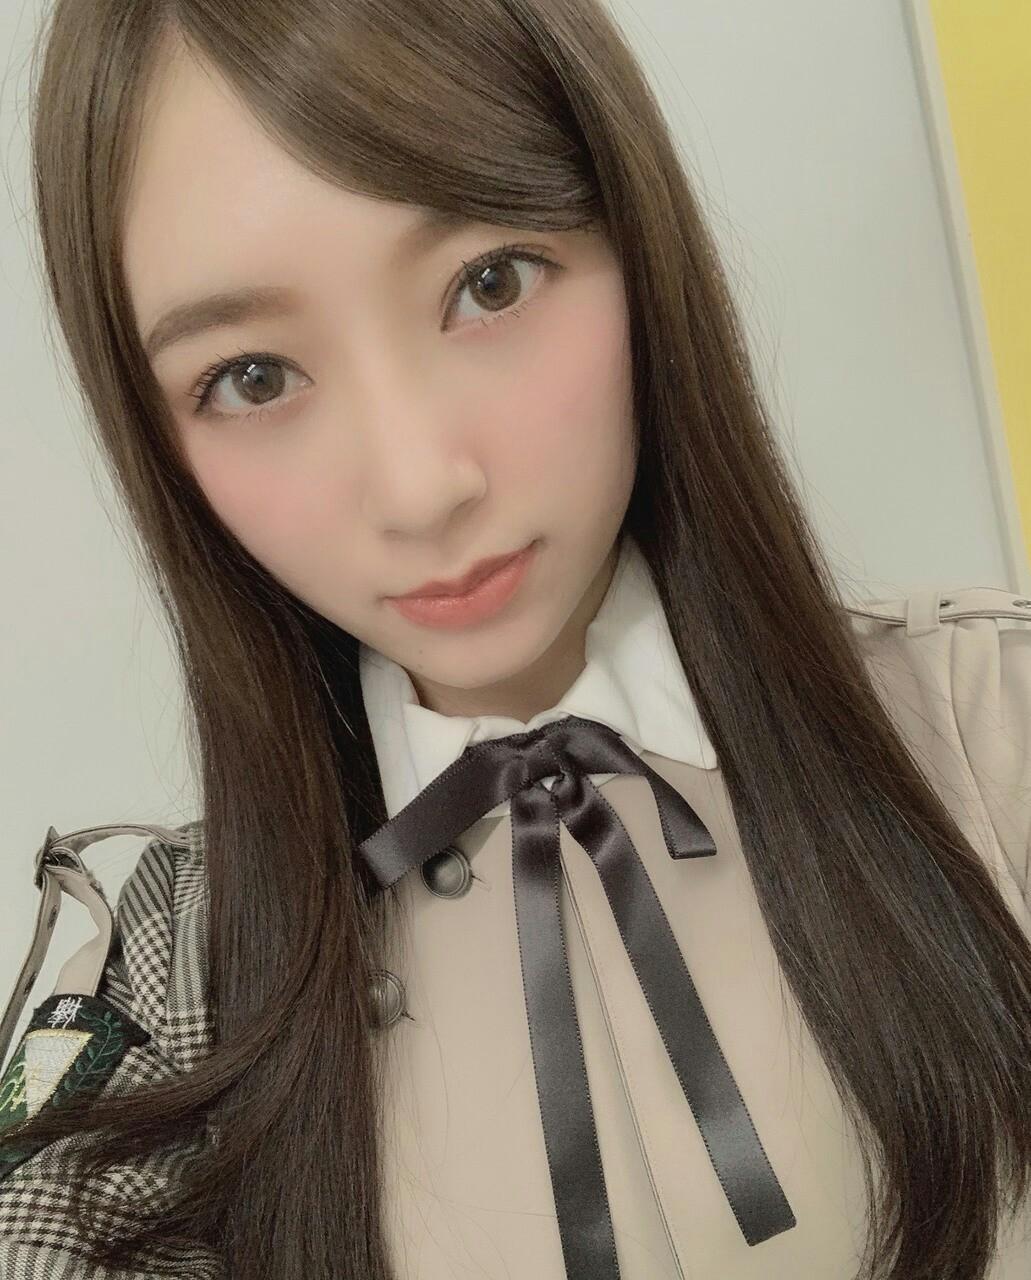 f:id:asitaha46:20190614025853j:image